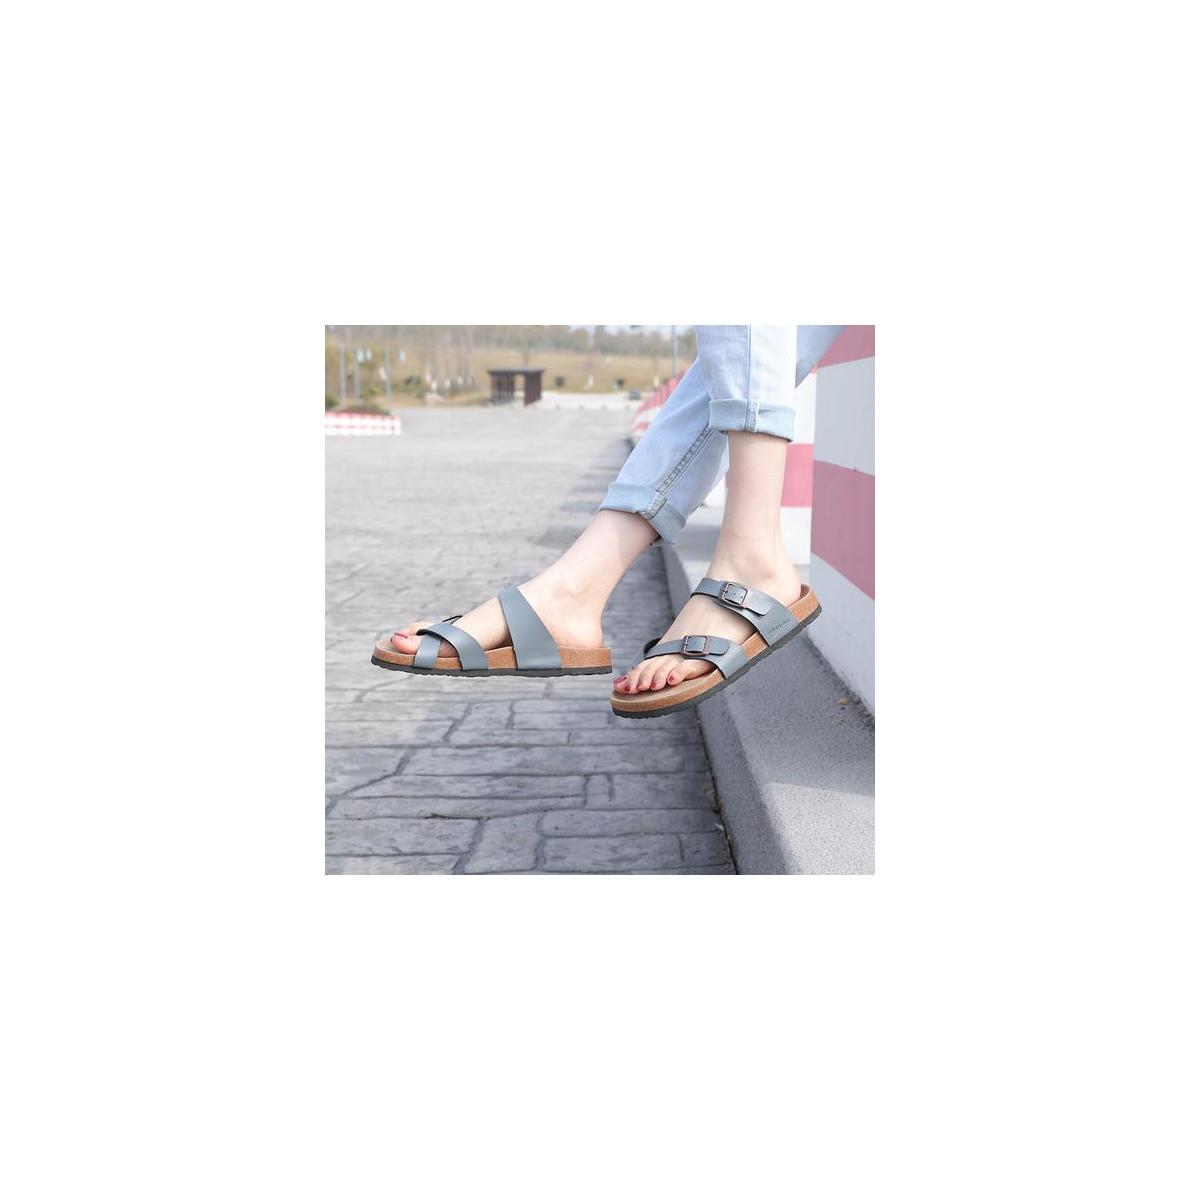 Seranoma Women's Toe Ring Cork Sandal | Classic Ladies Sandal | Flat Footed Dual Adjustable Buckle | Breathable Open Toe Slide | Comfort …